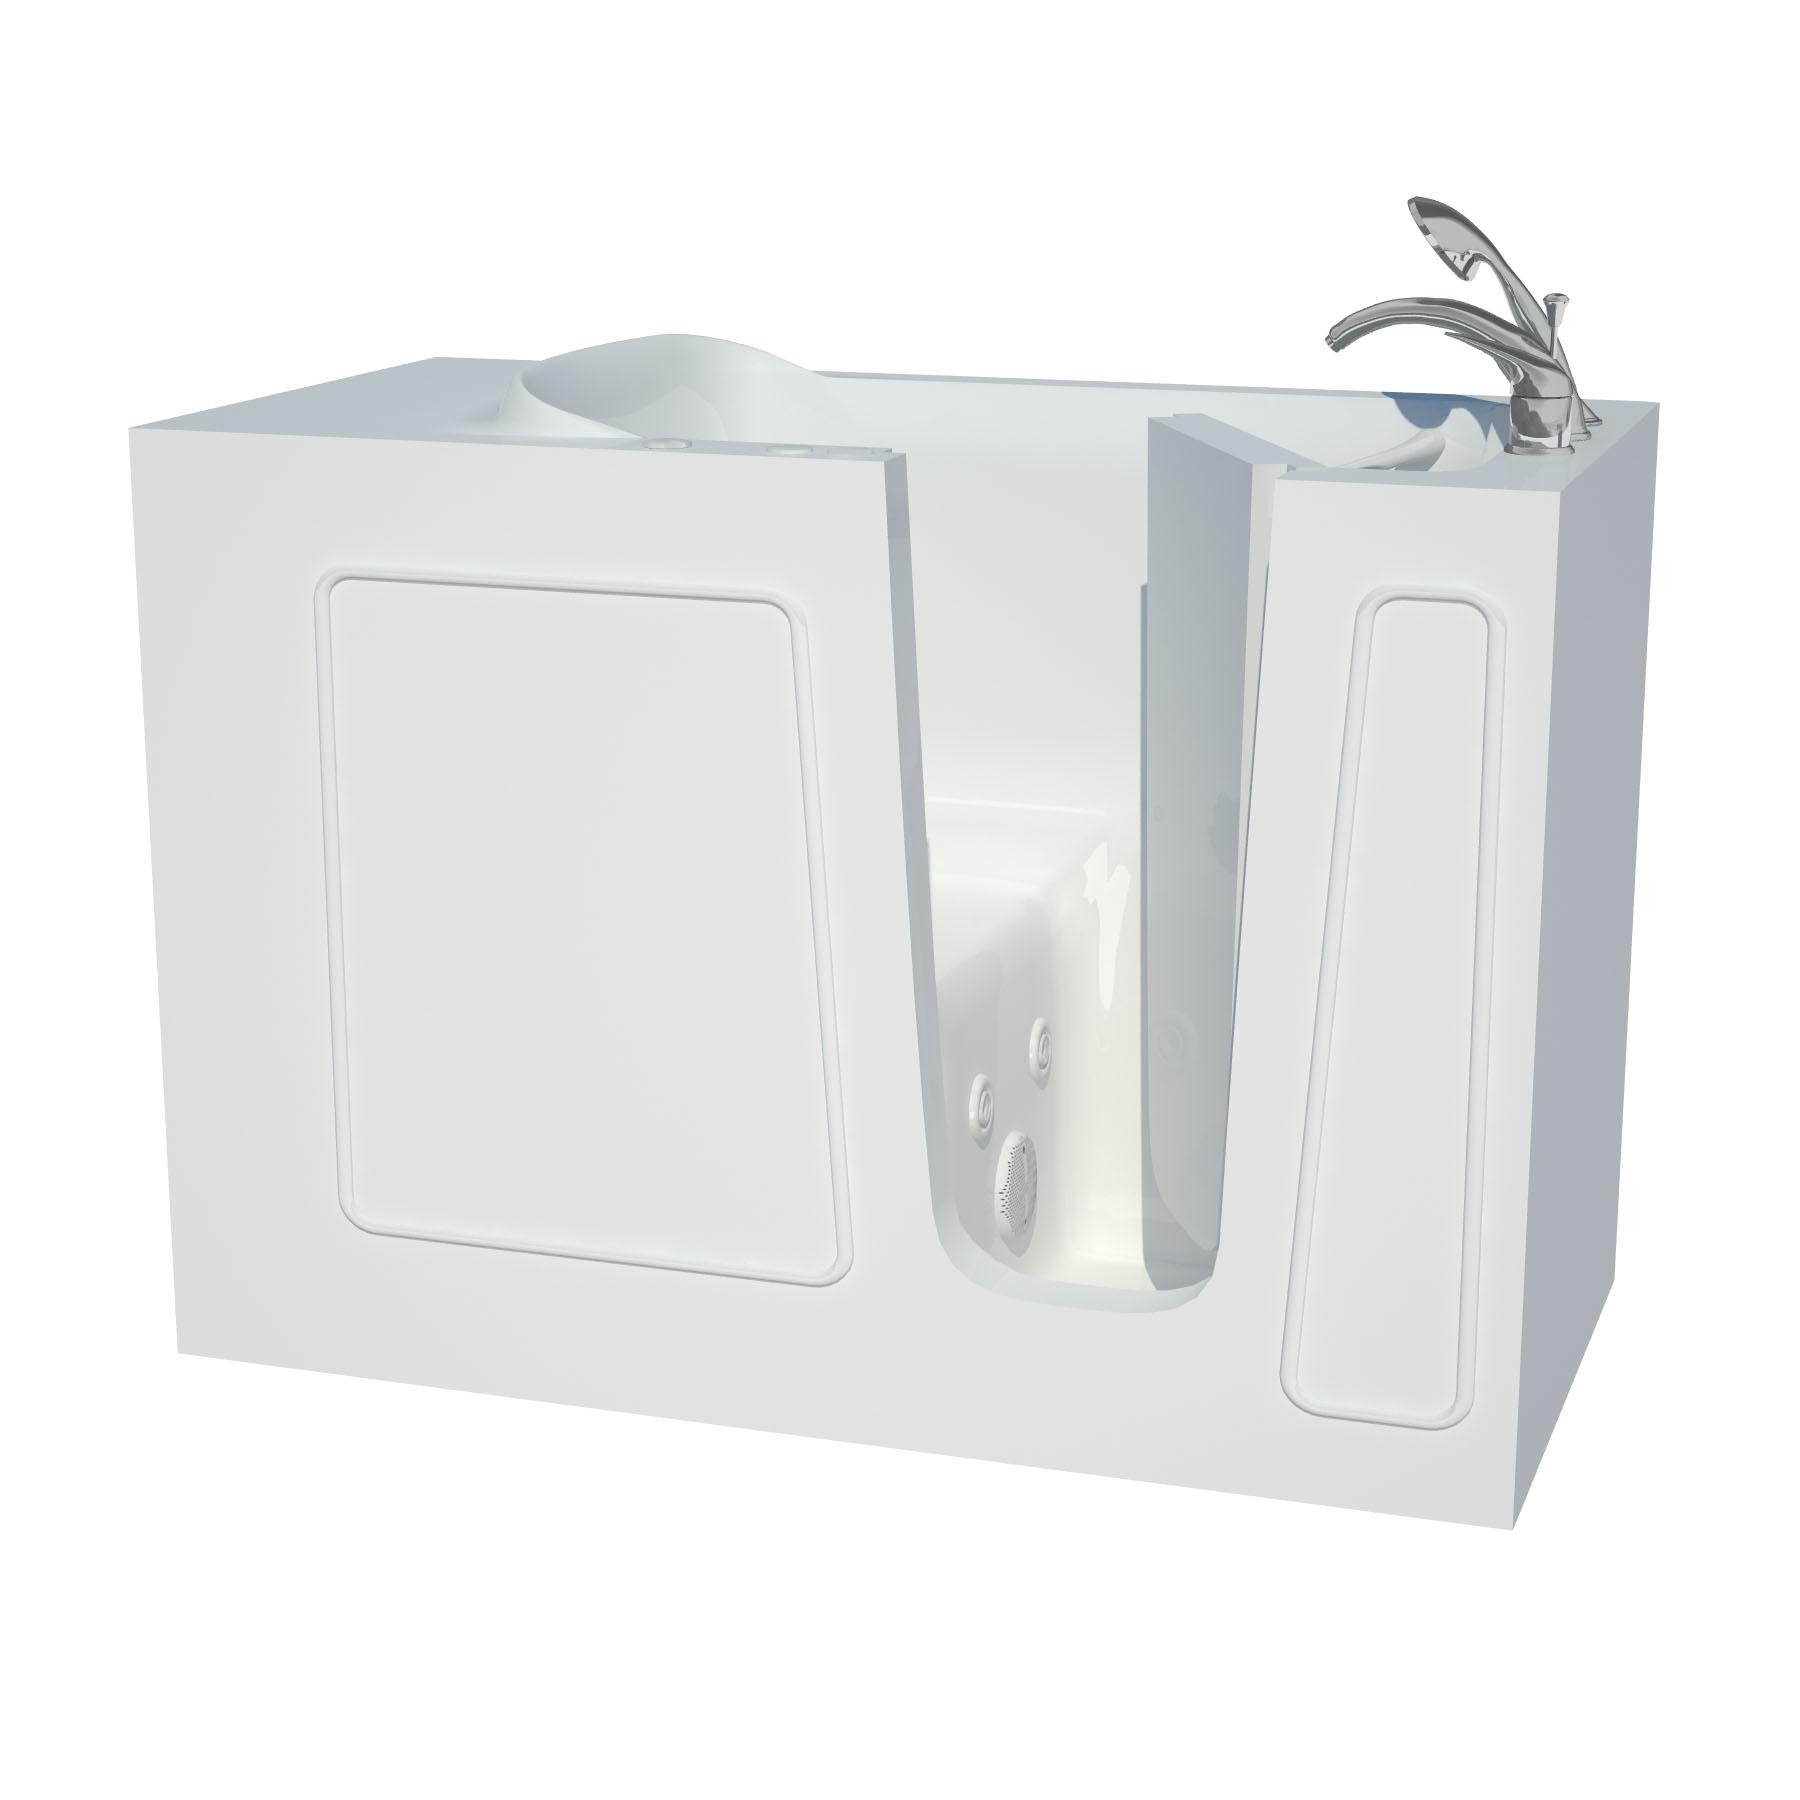 26 x 53 White Whirlpool Walk-In Tub Right